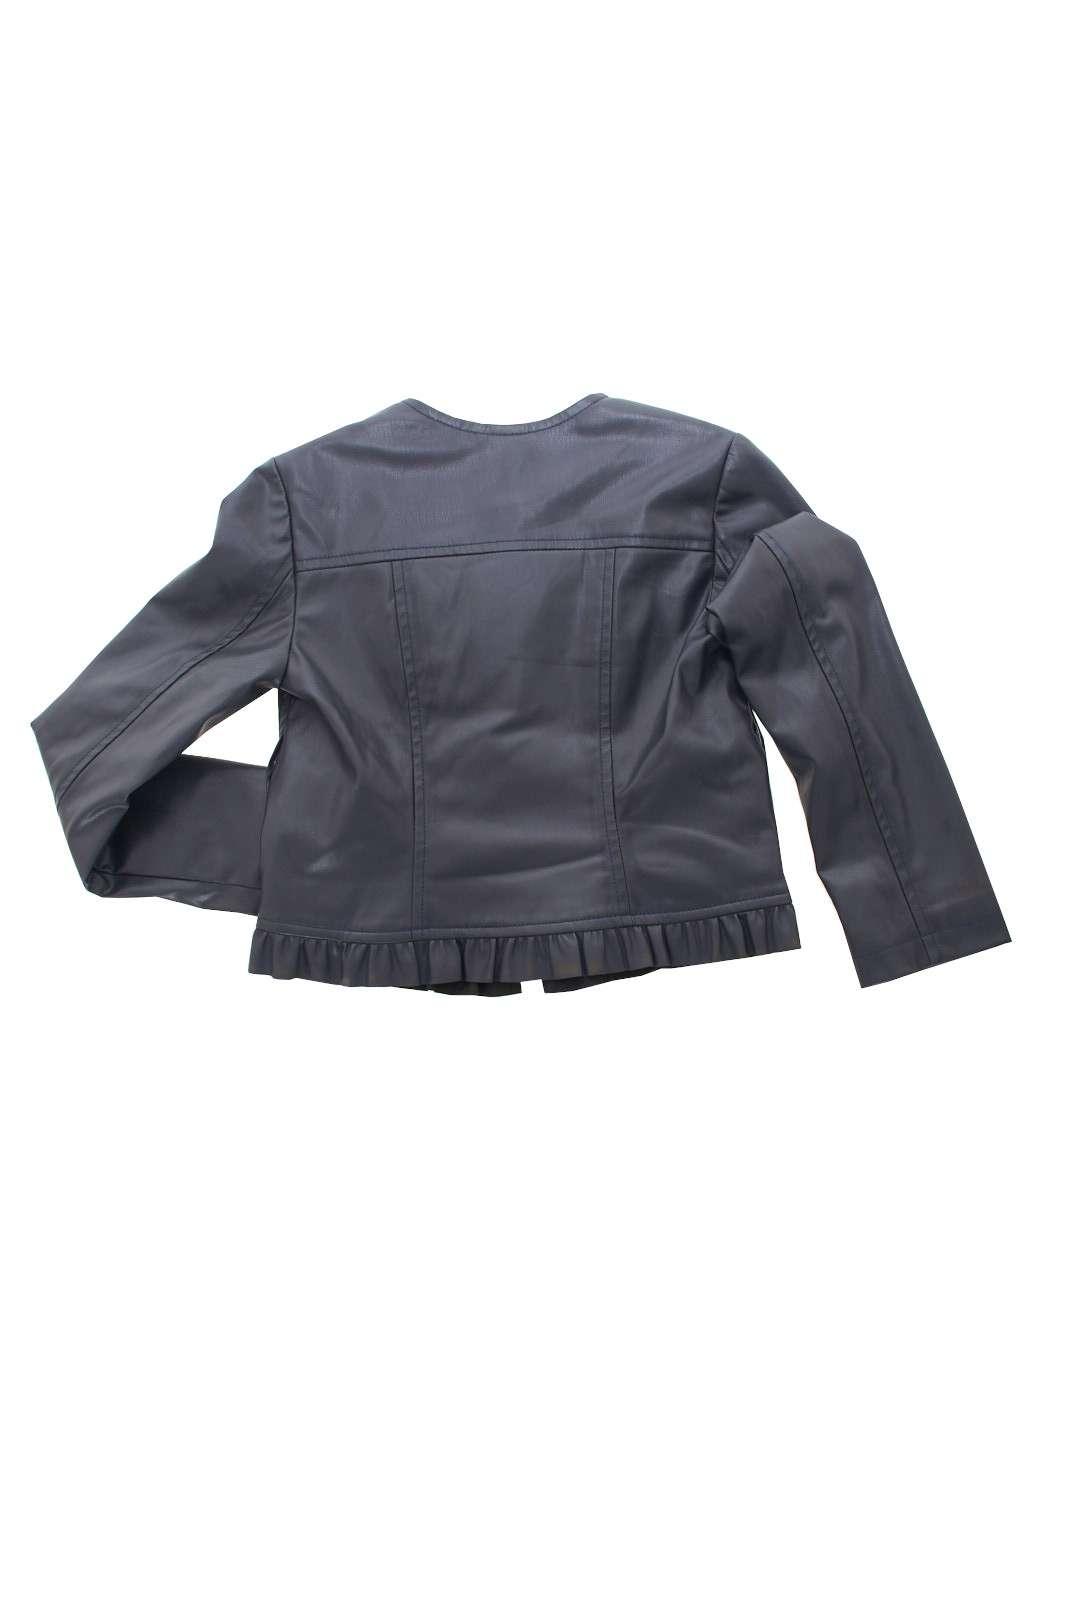 https://www.parmax.com/media/catalog/product/a/i/PE-outlet_parmax-giubbino-bambina-Liu-Jo-D19082E0392-B.jpg